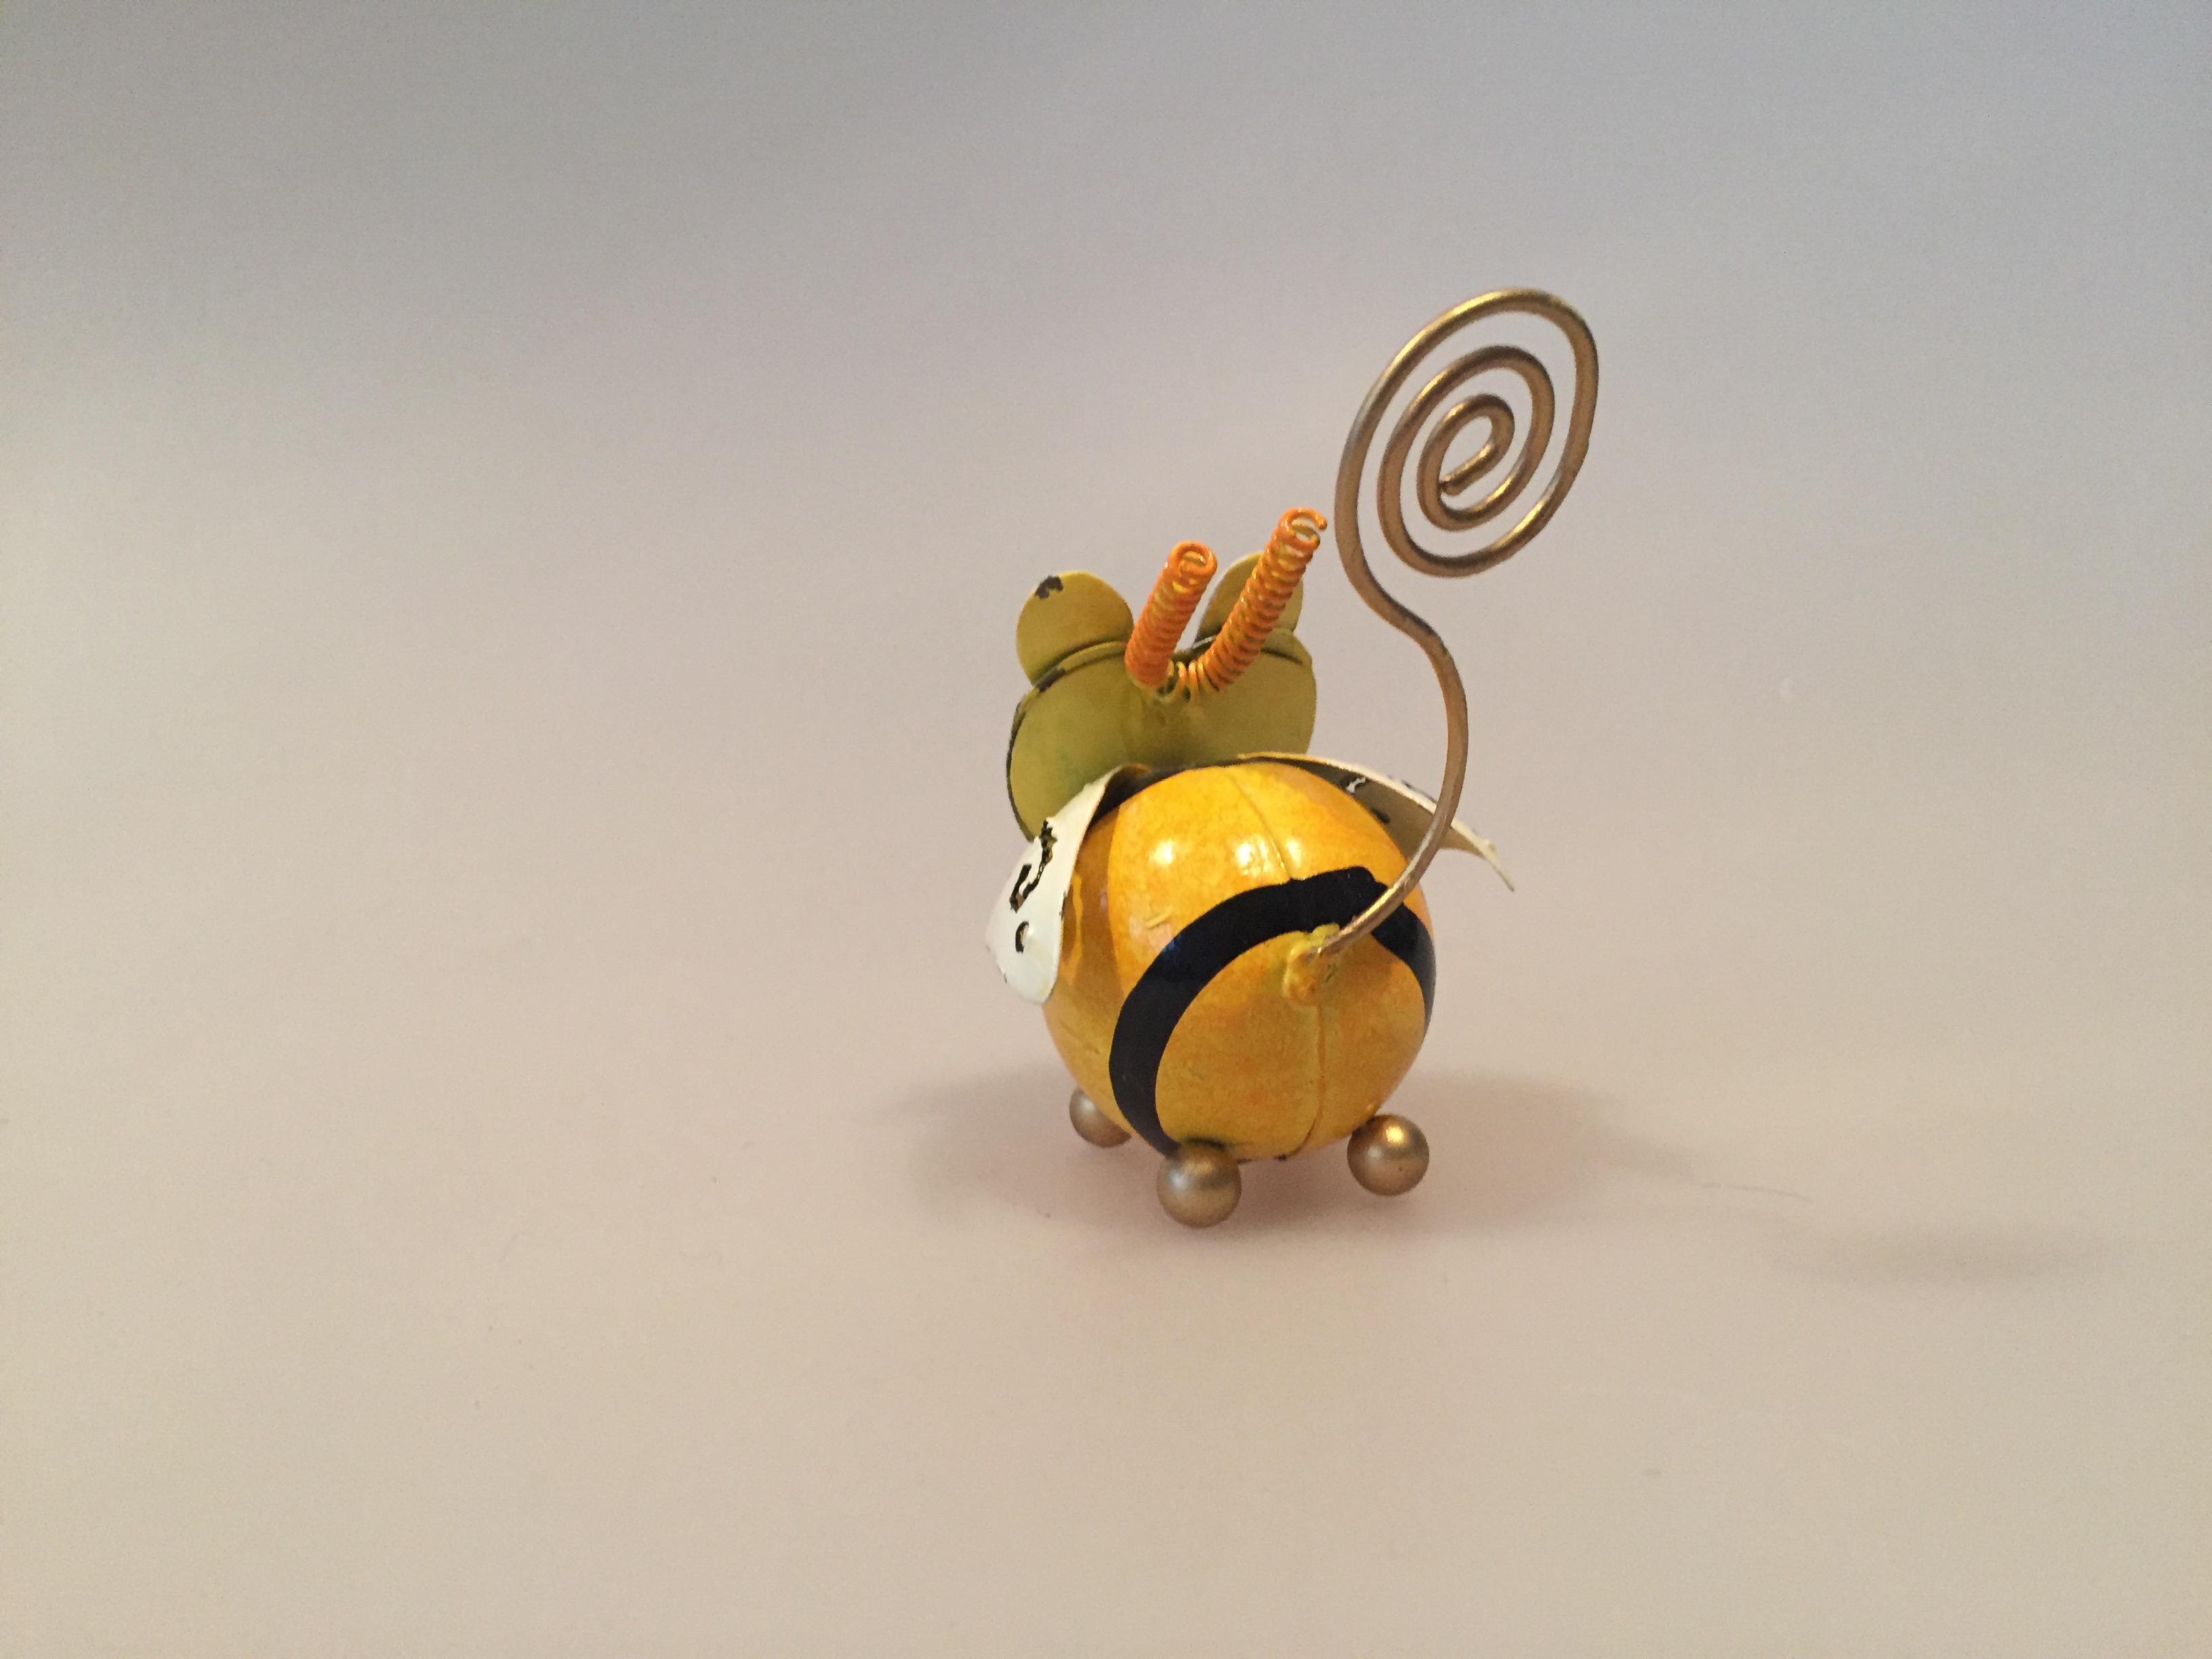 Memo holder metal - Gul bi, honningbi, humlebi, flittig som en bi, arbejdsbi, memoholder, pengeholder, pengegave, huskeseddel, fotoholder, metalbi, metalfigur, gaveidé, naturen, biodiversitet, pas på bierne